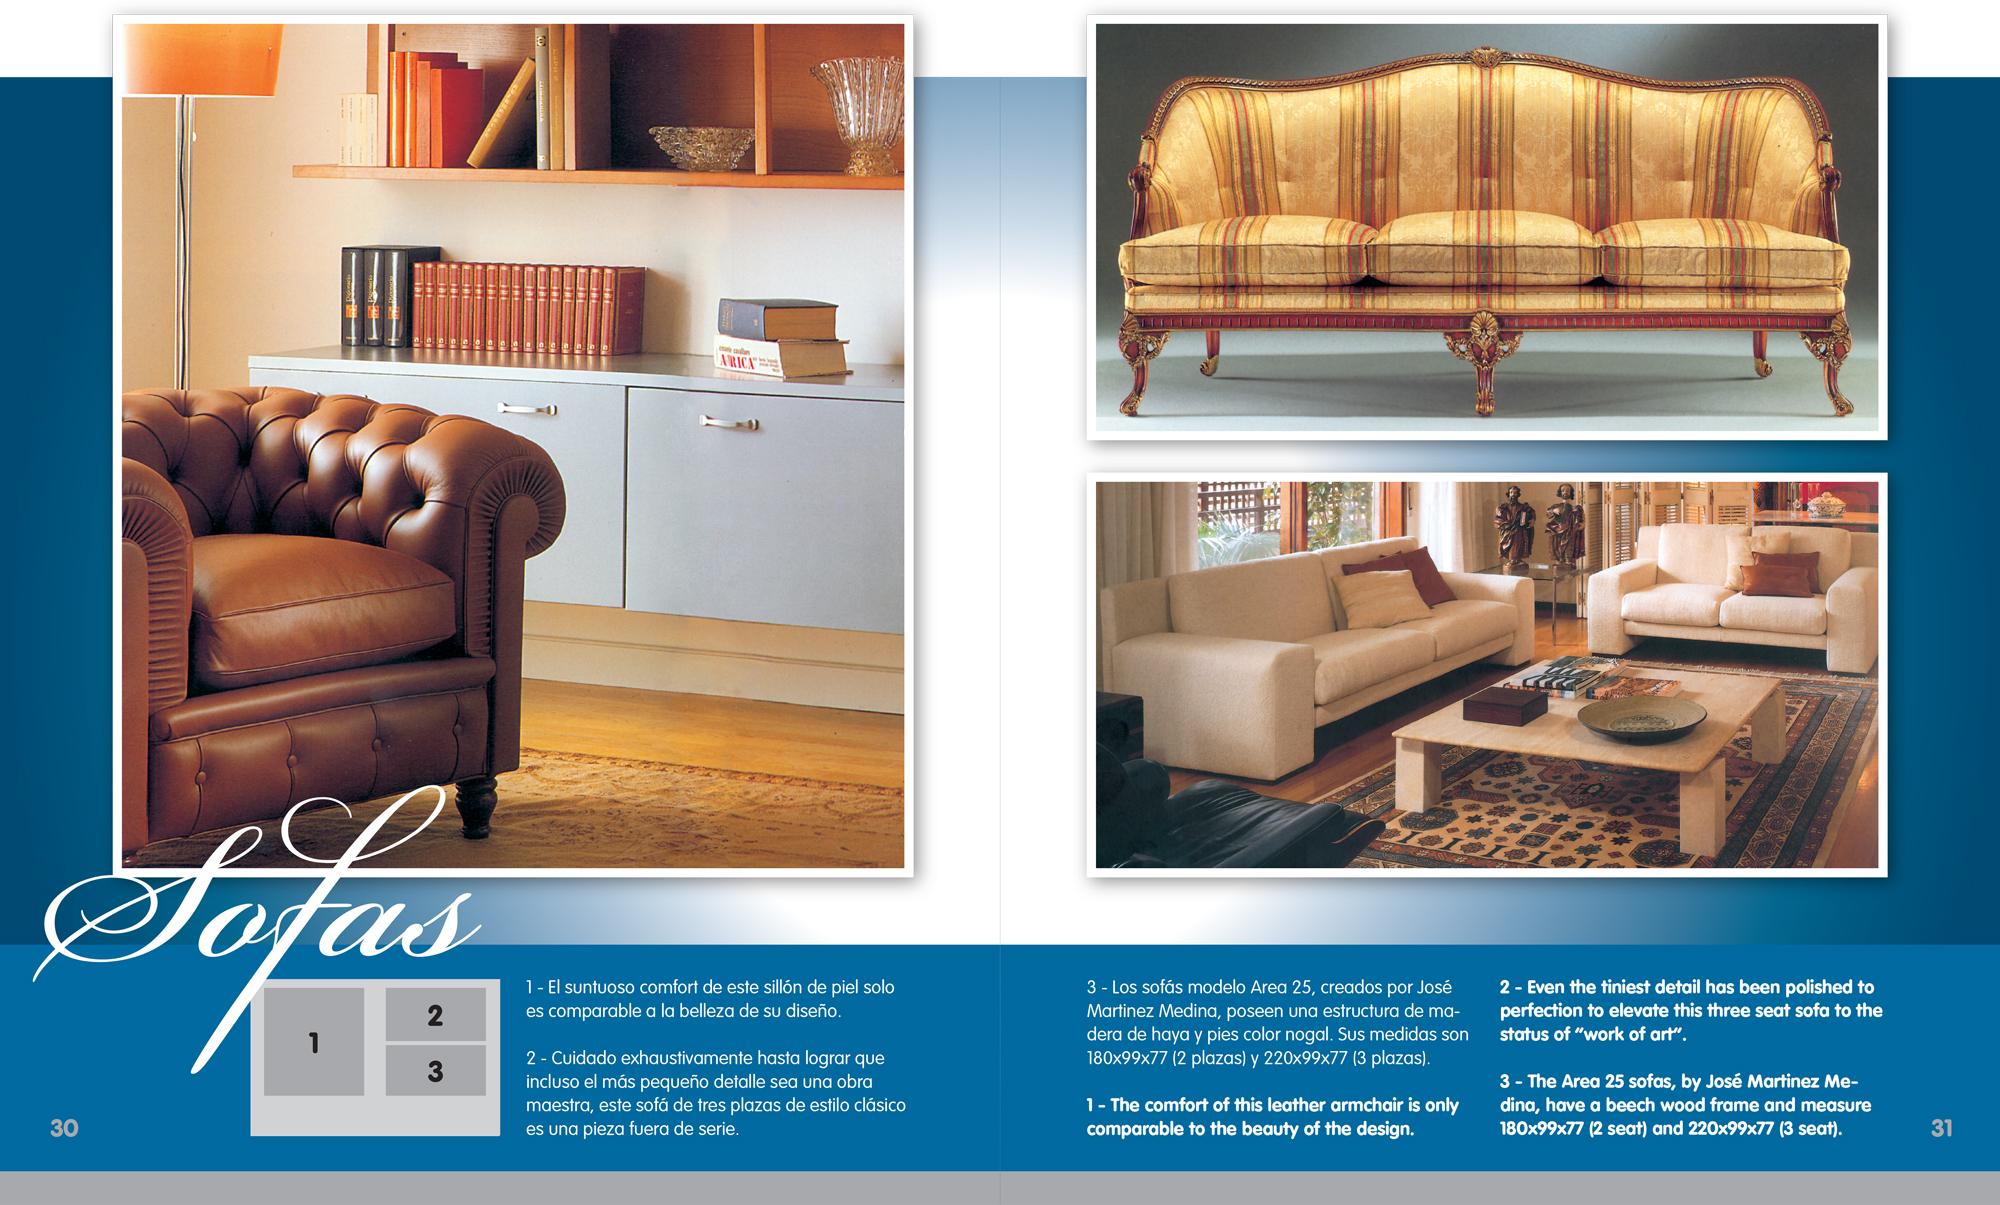 sofas2.jpg